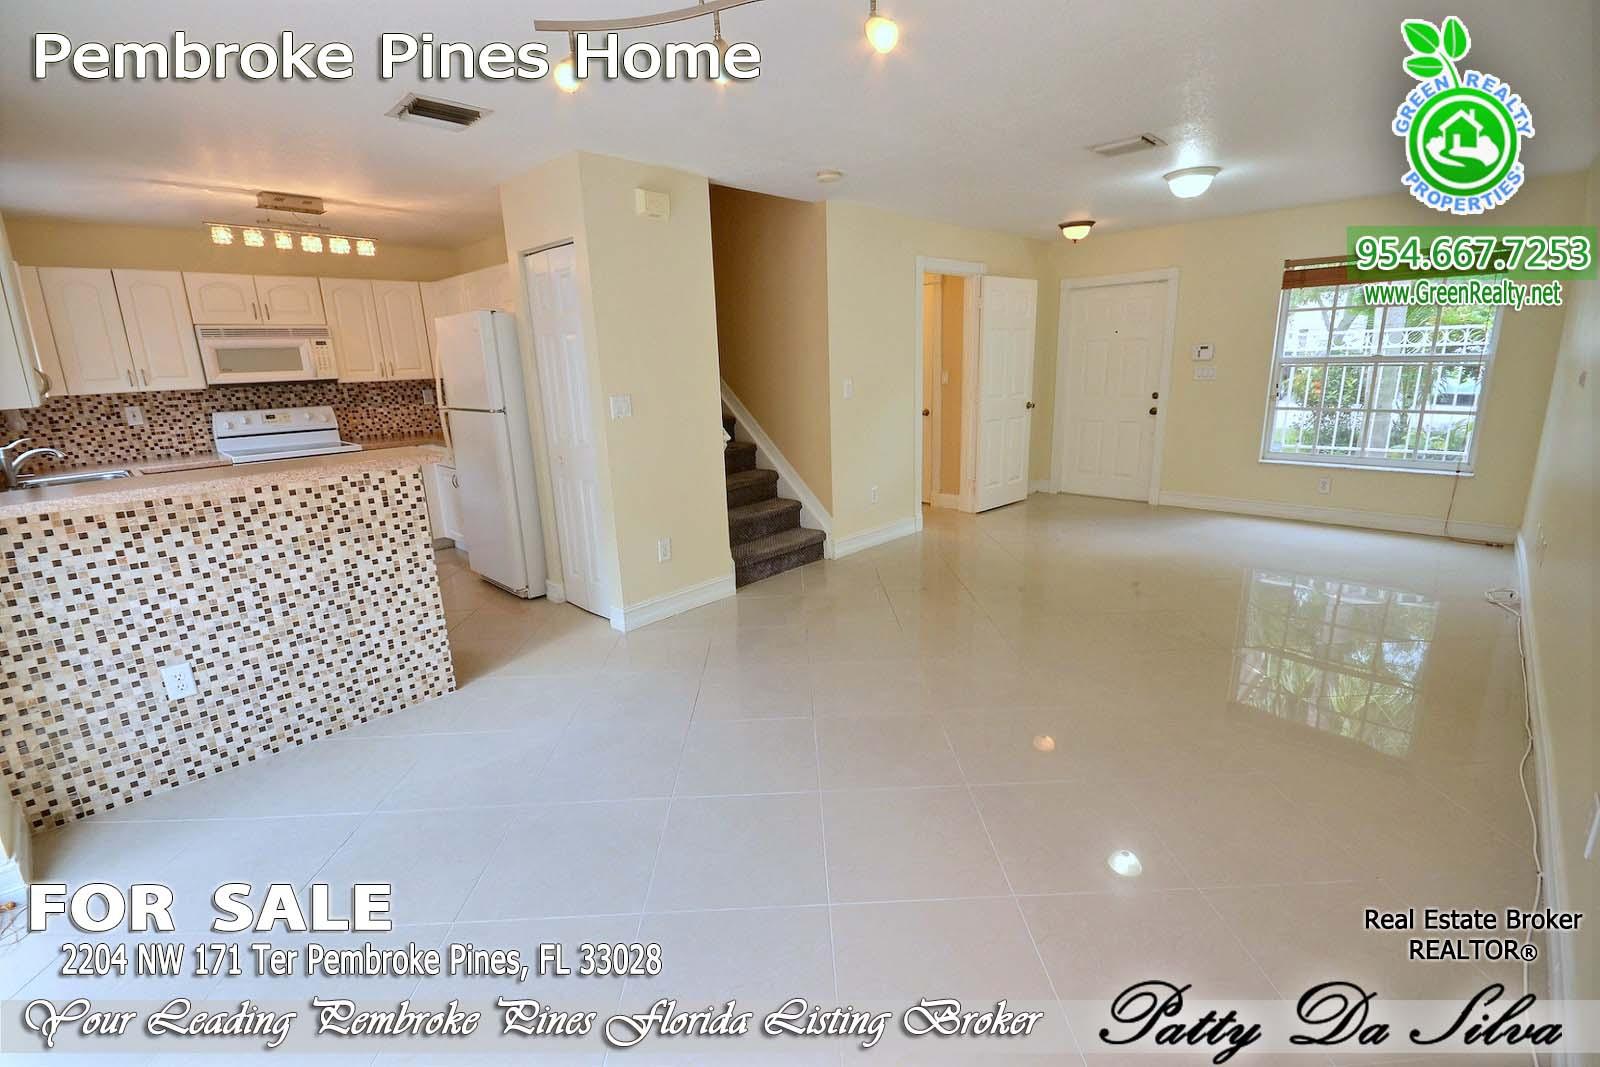 Pembroke Pines Homes For Sale - Pembroke Isles (13)